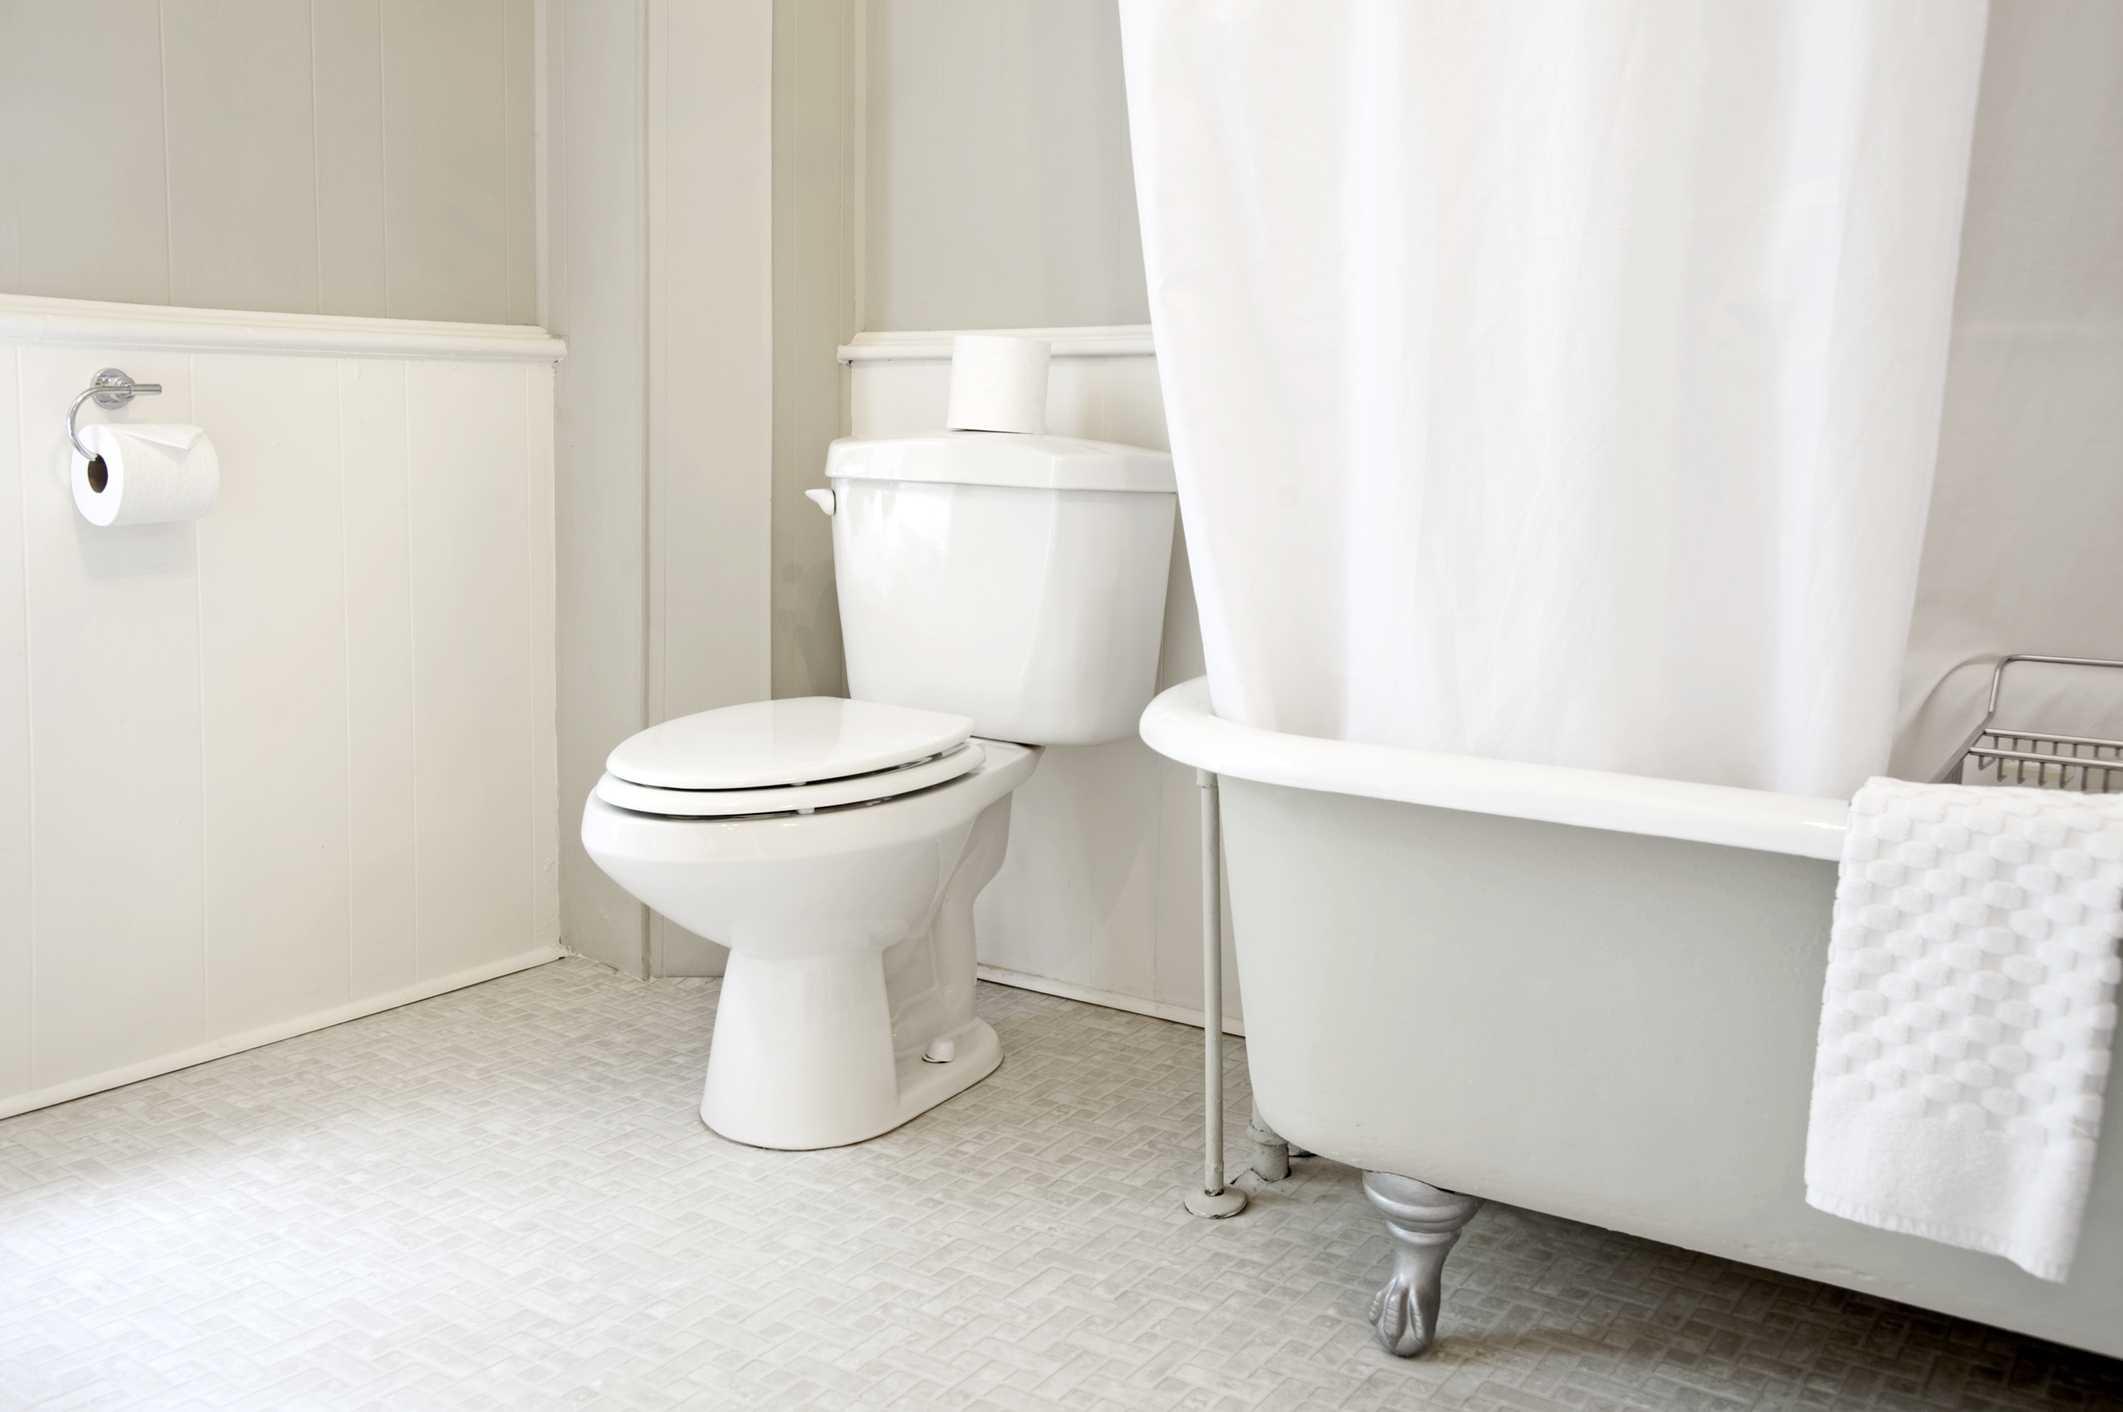 Wisconsin man admits to hiding cameras in best friend's bathroom